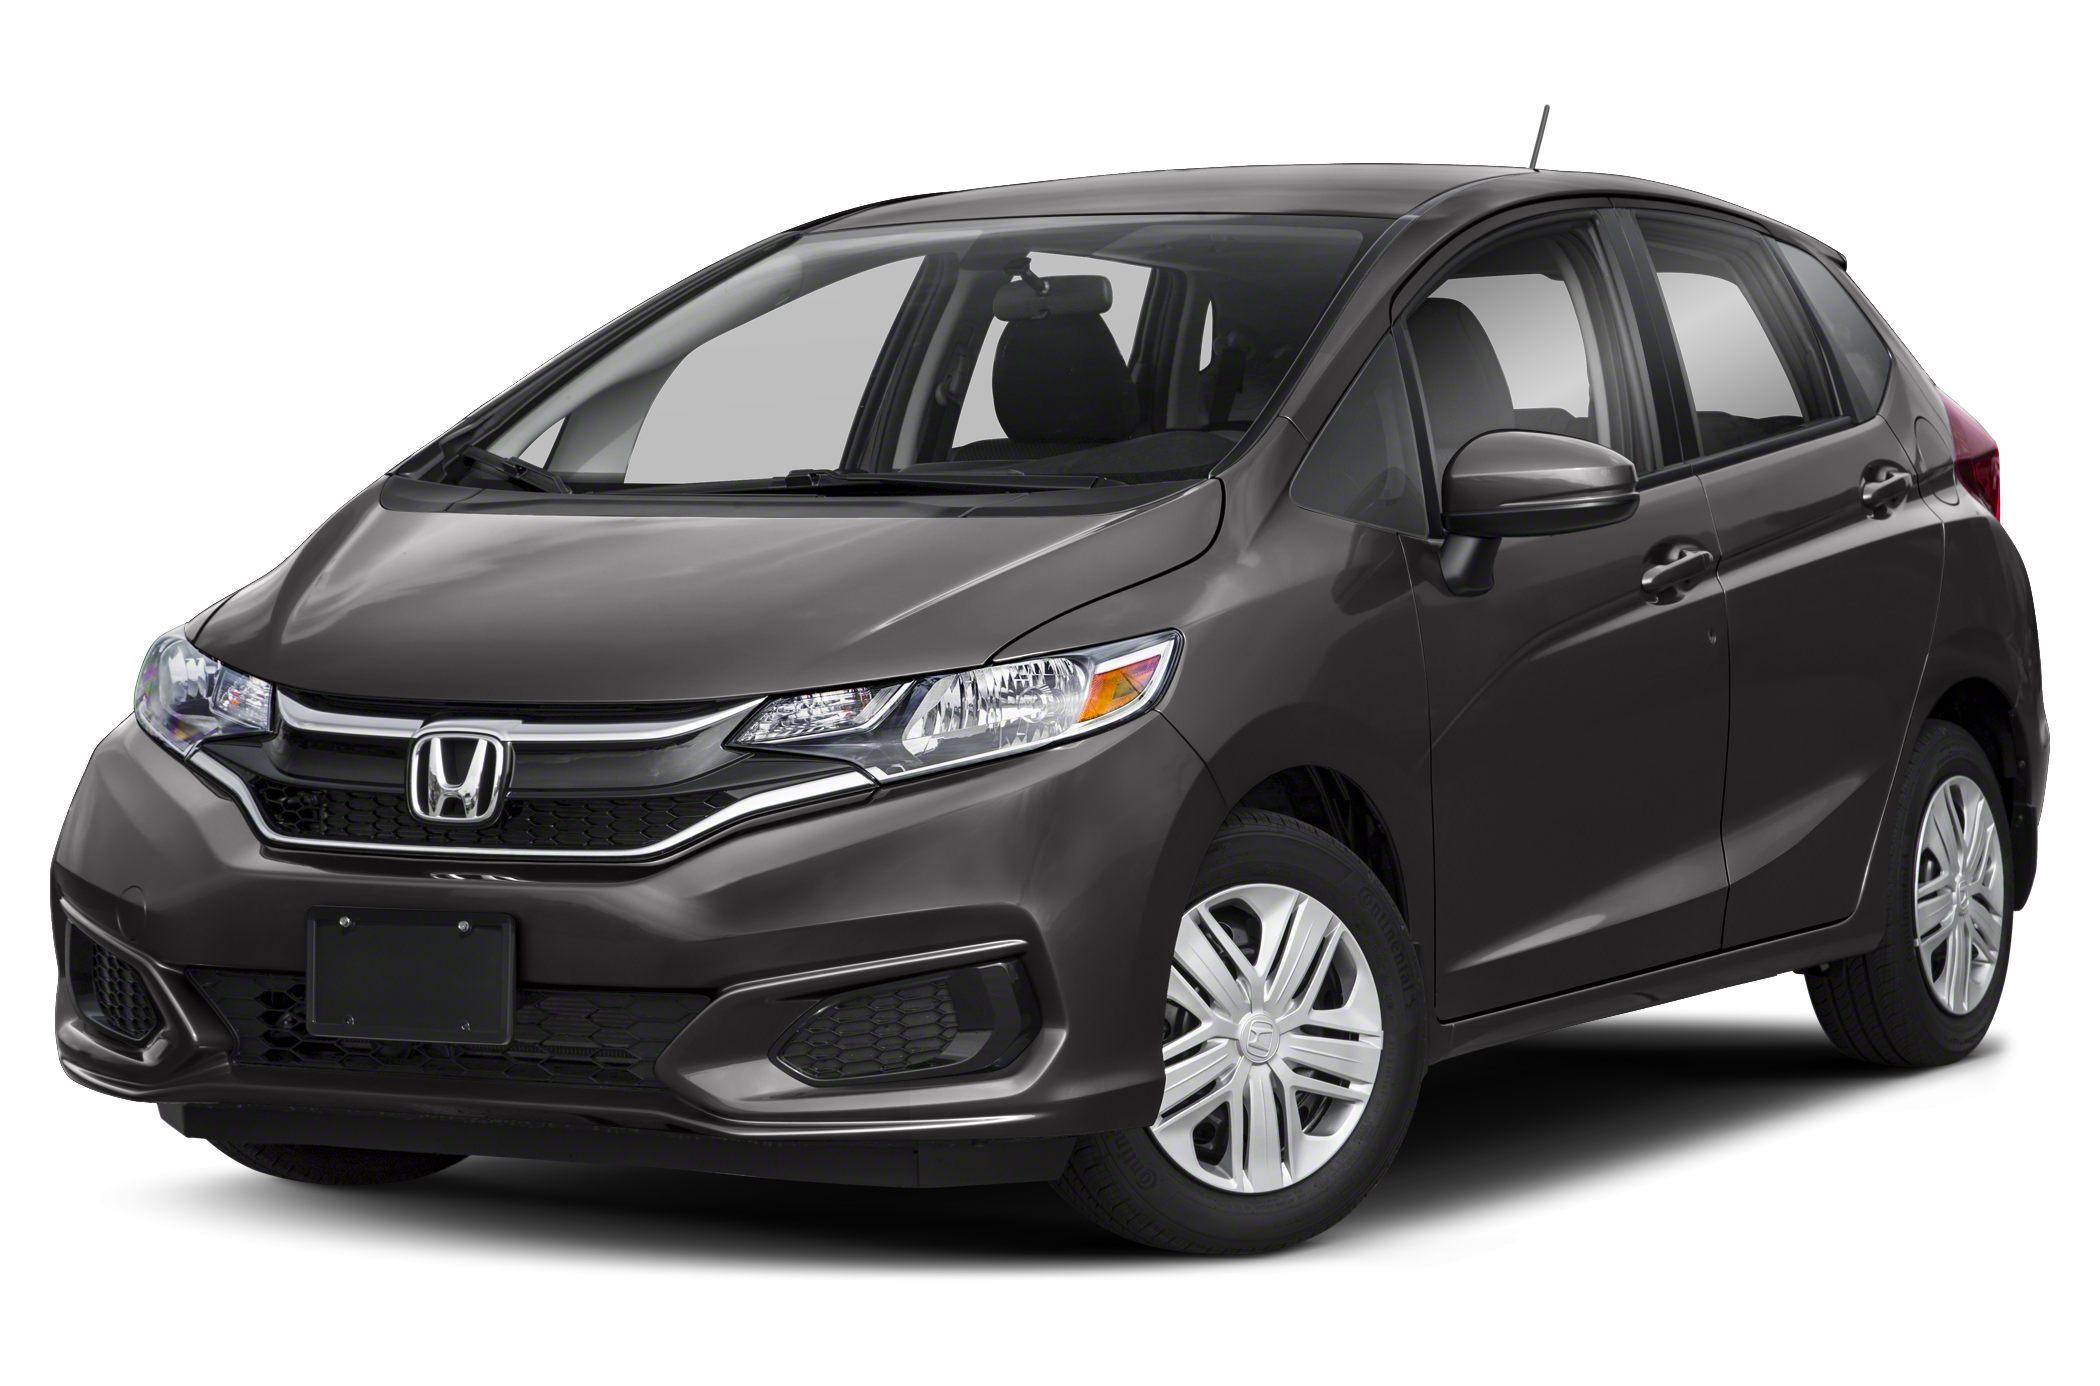 2020 Honda Fit Redesign Info Pricing Release Date